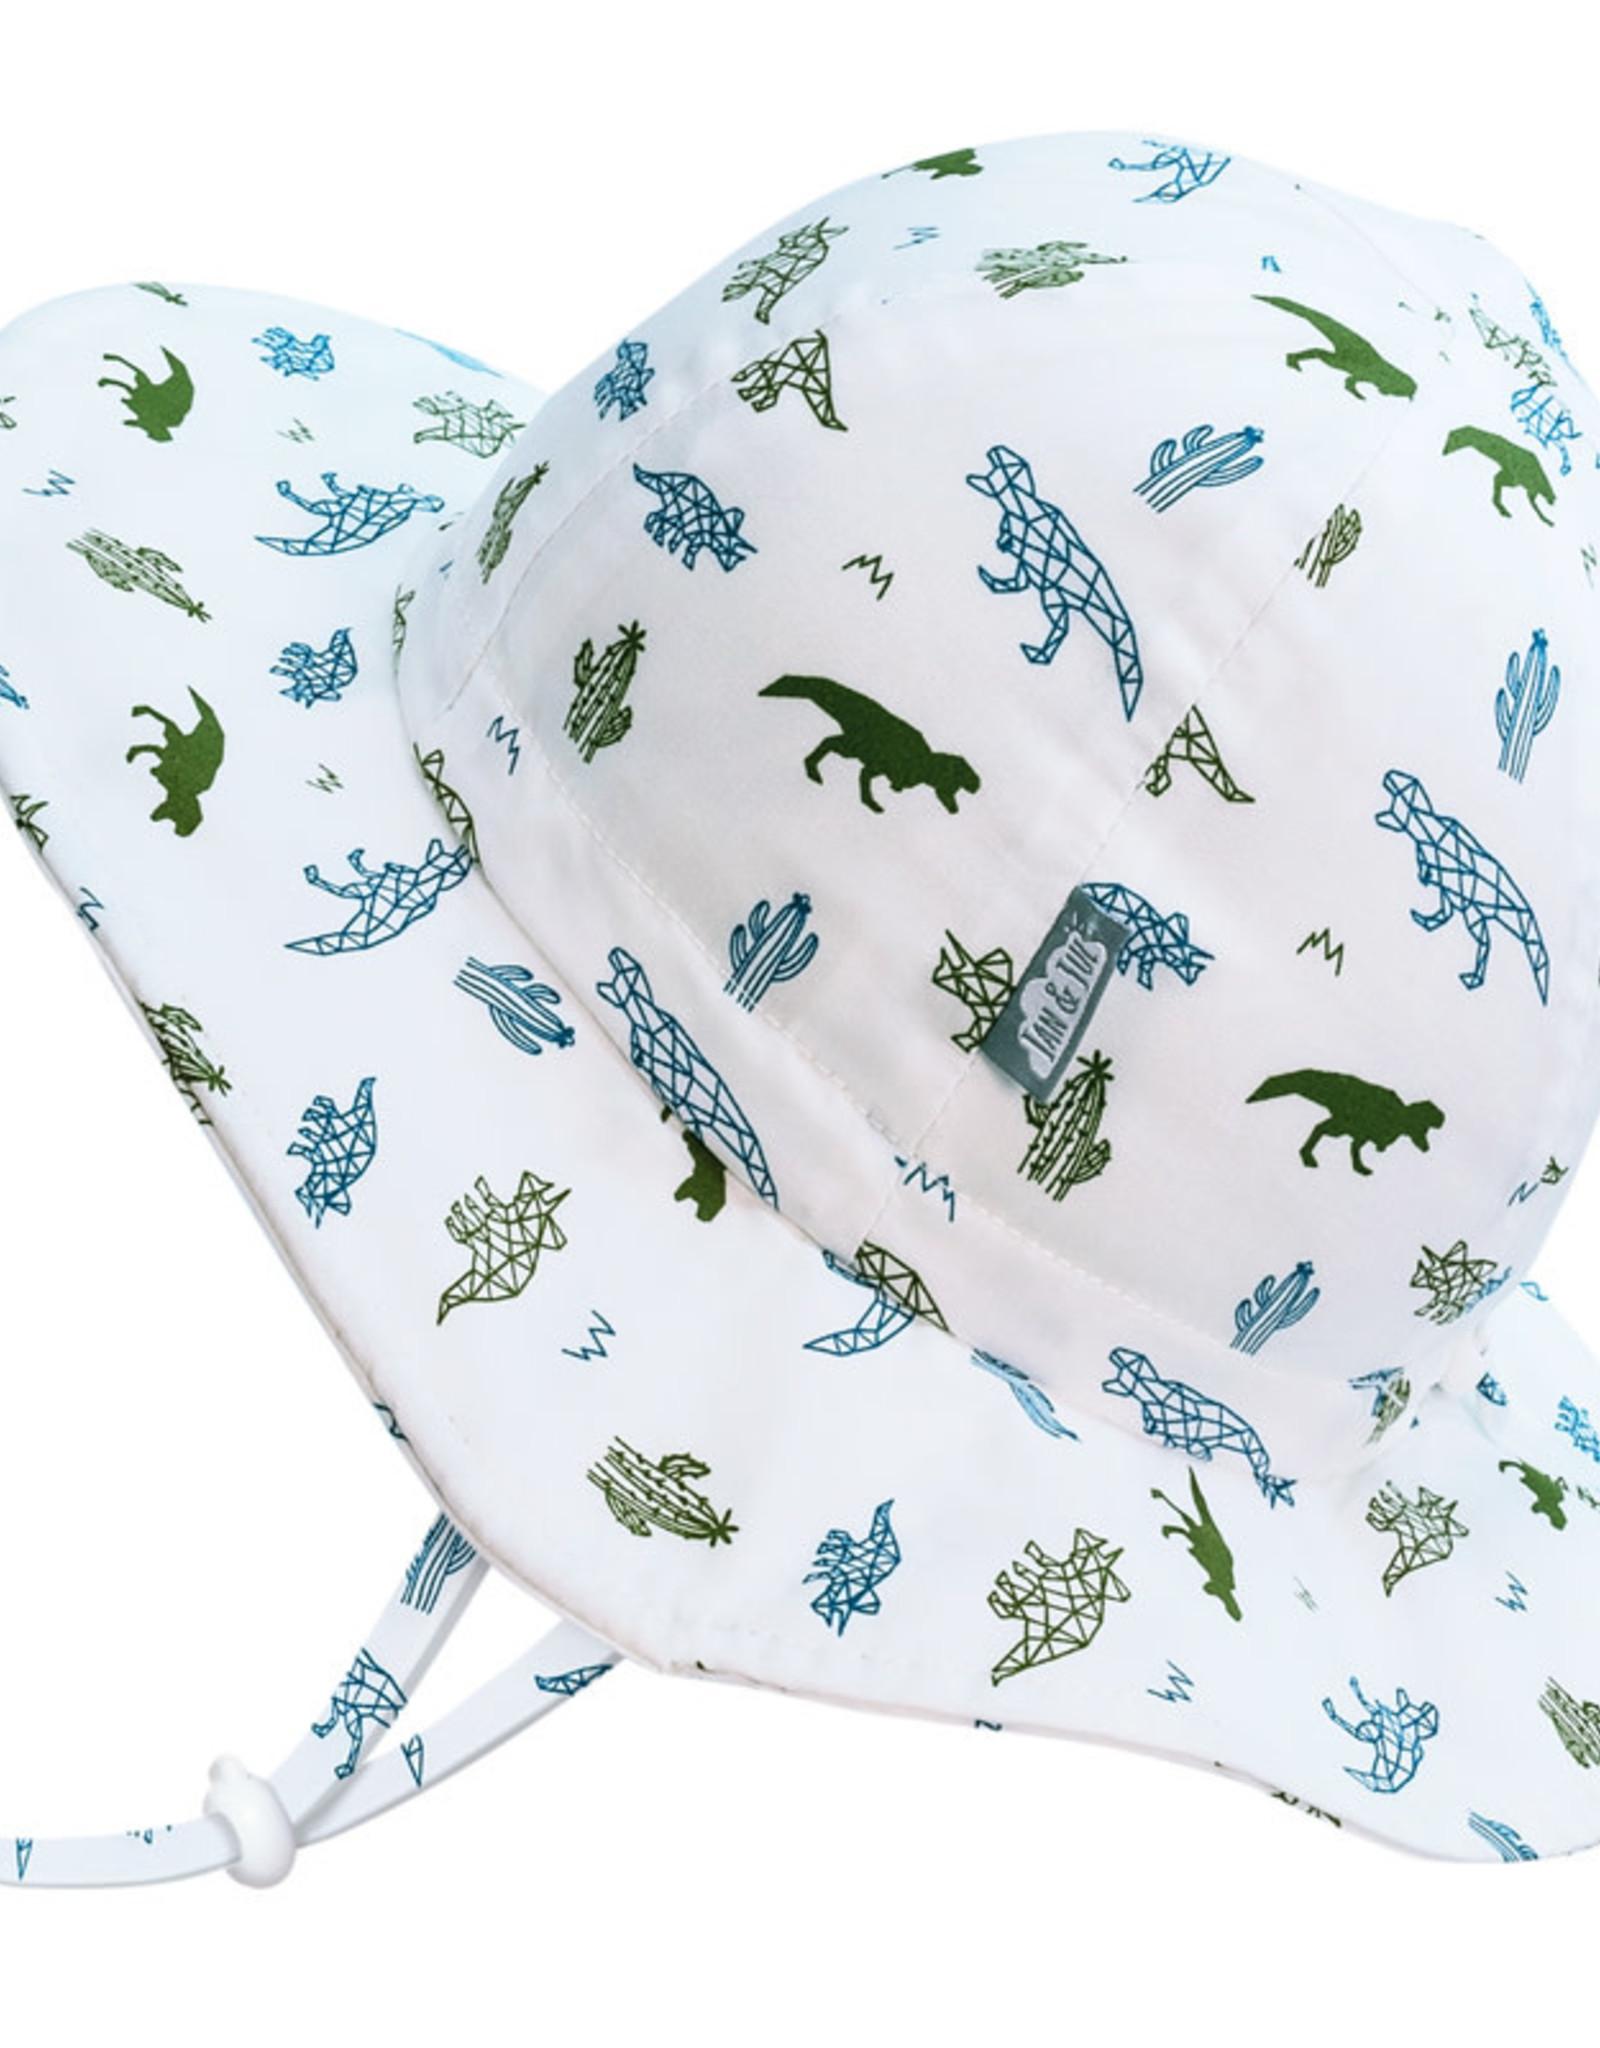 Jan & Jul Jan & Jul Dino Cotton Floppy Hat